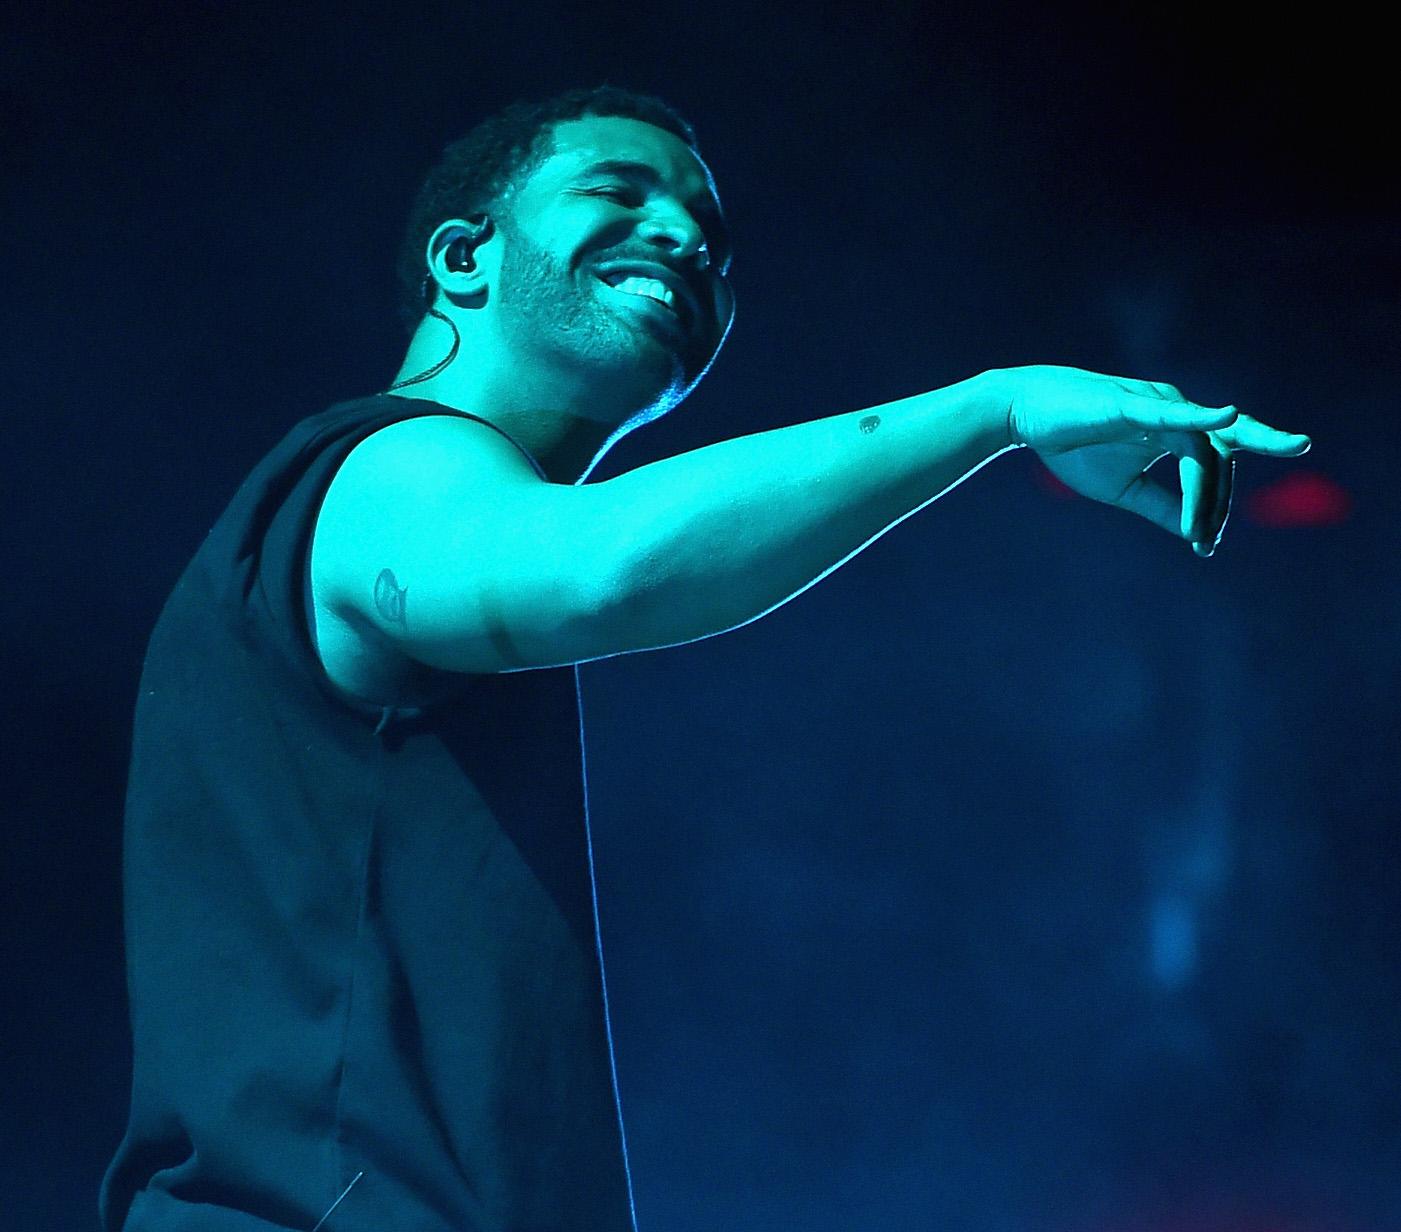 Drake 'respects' Kim Kardashian